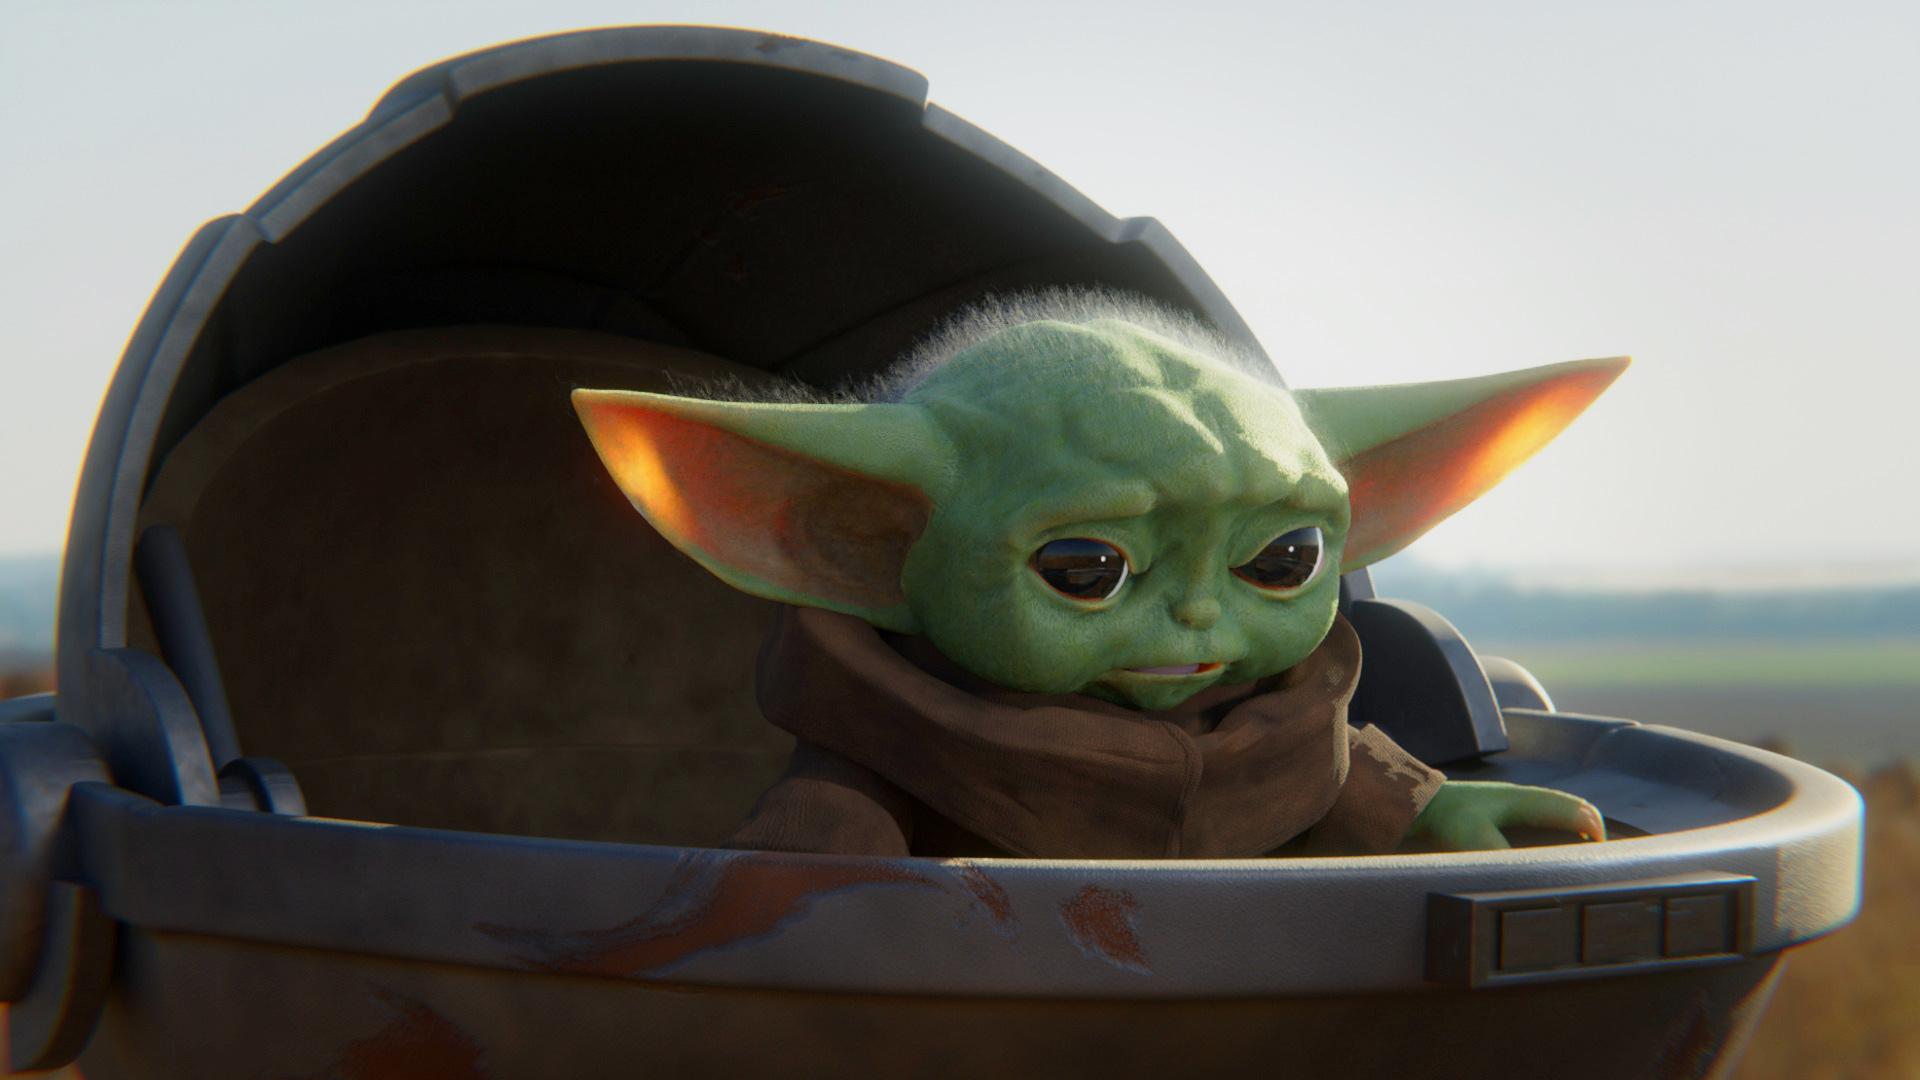 Star Wars Baby Yoda Wallpaper